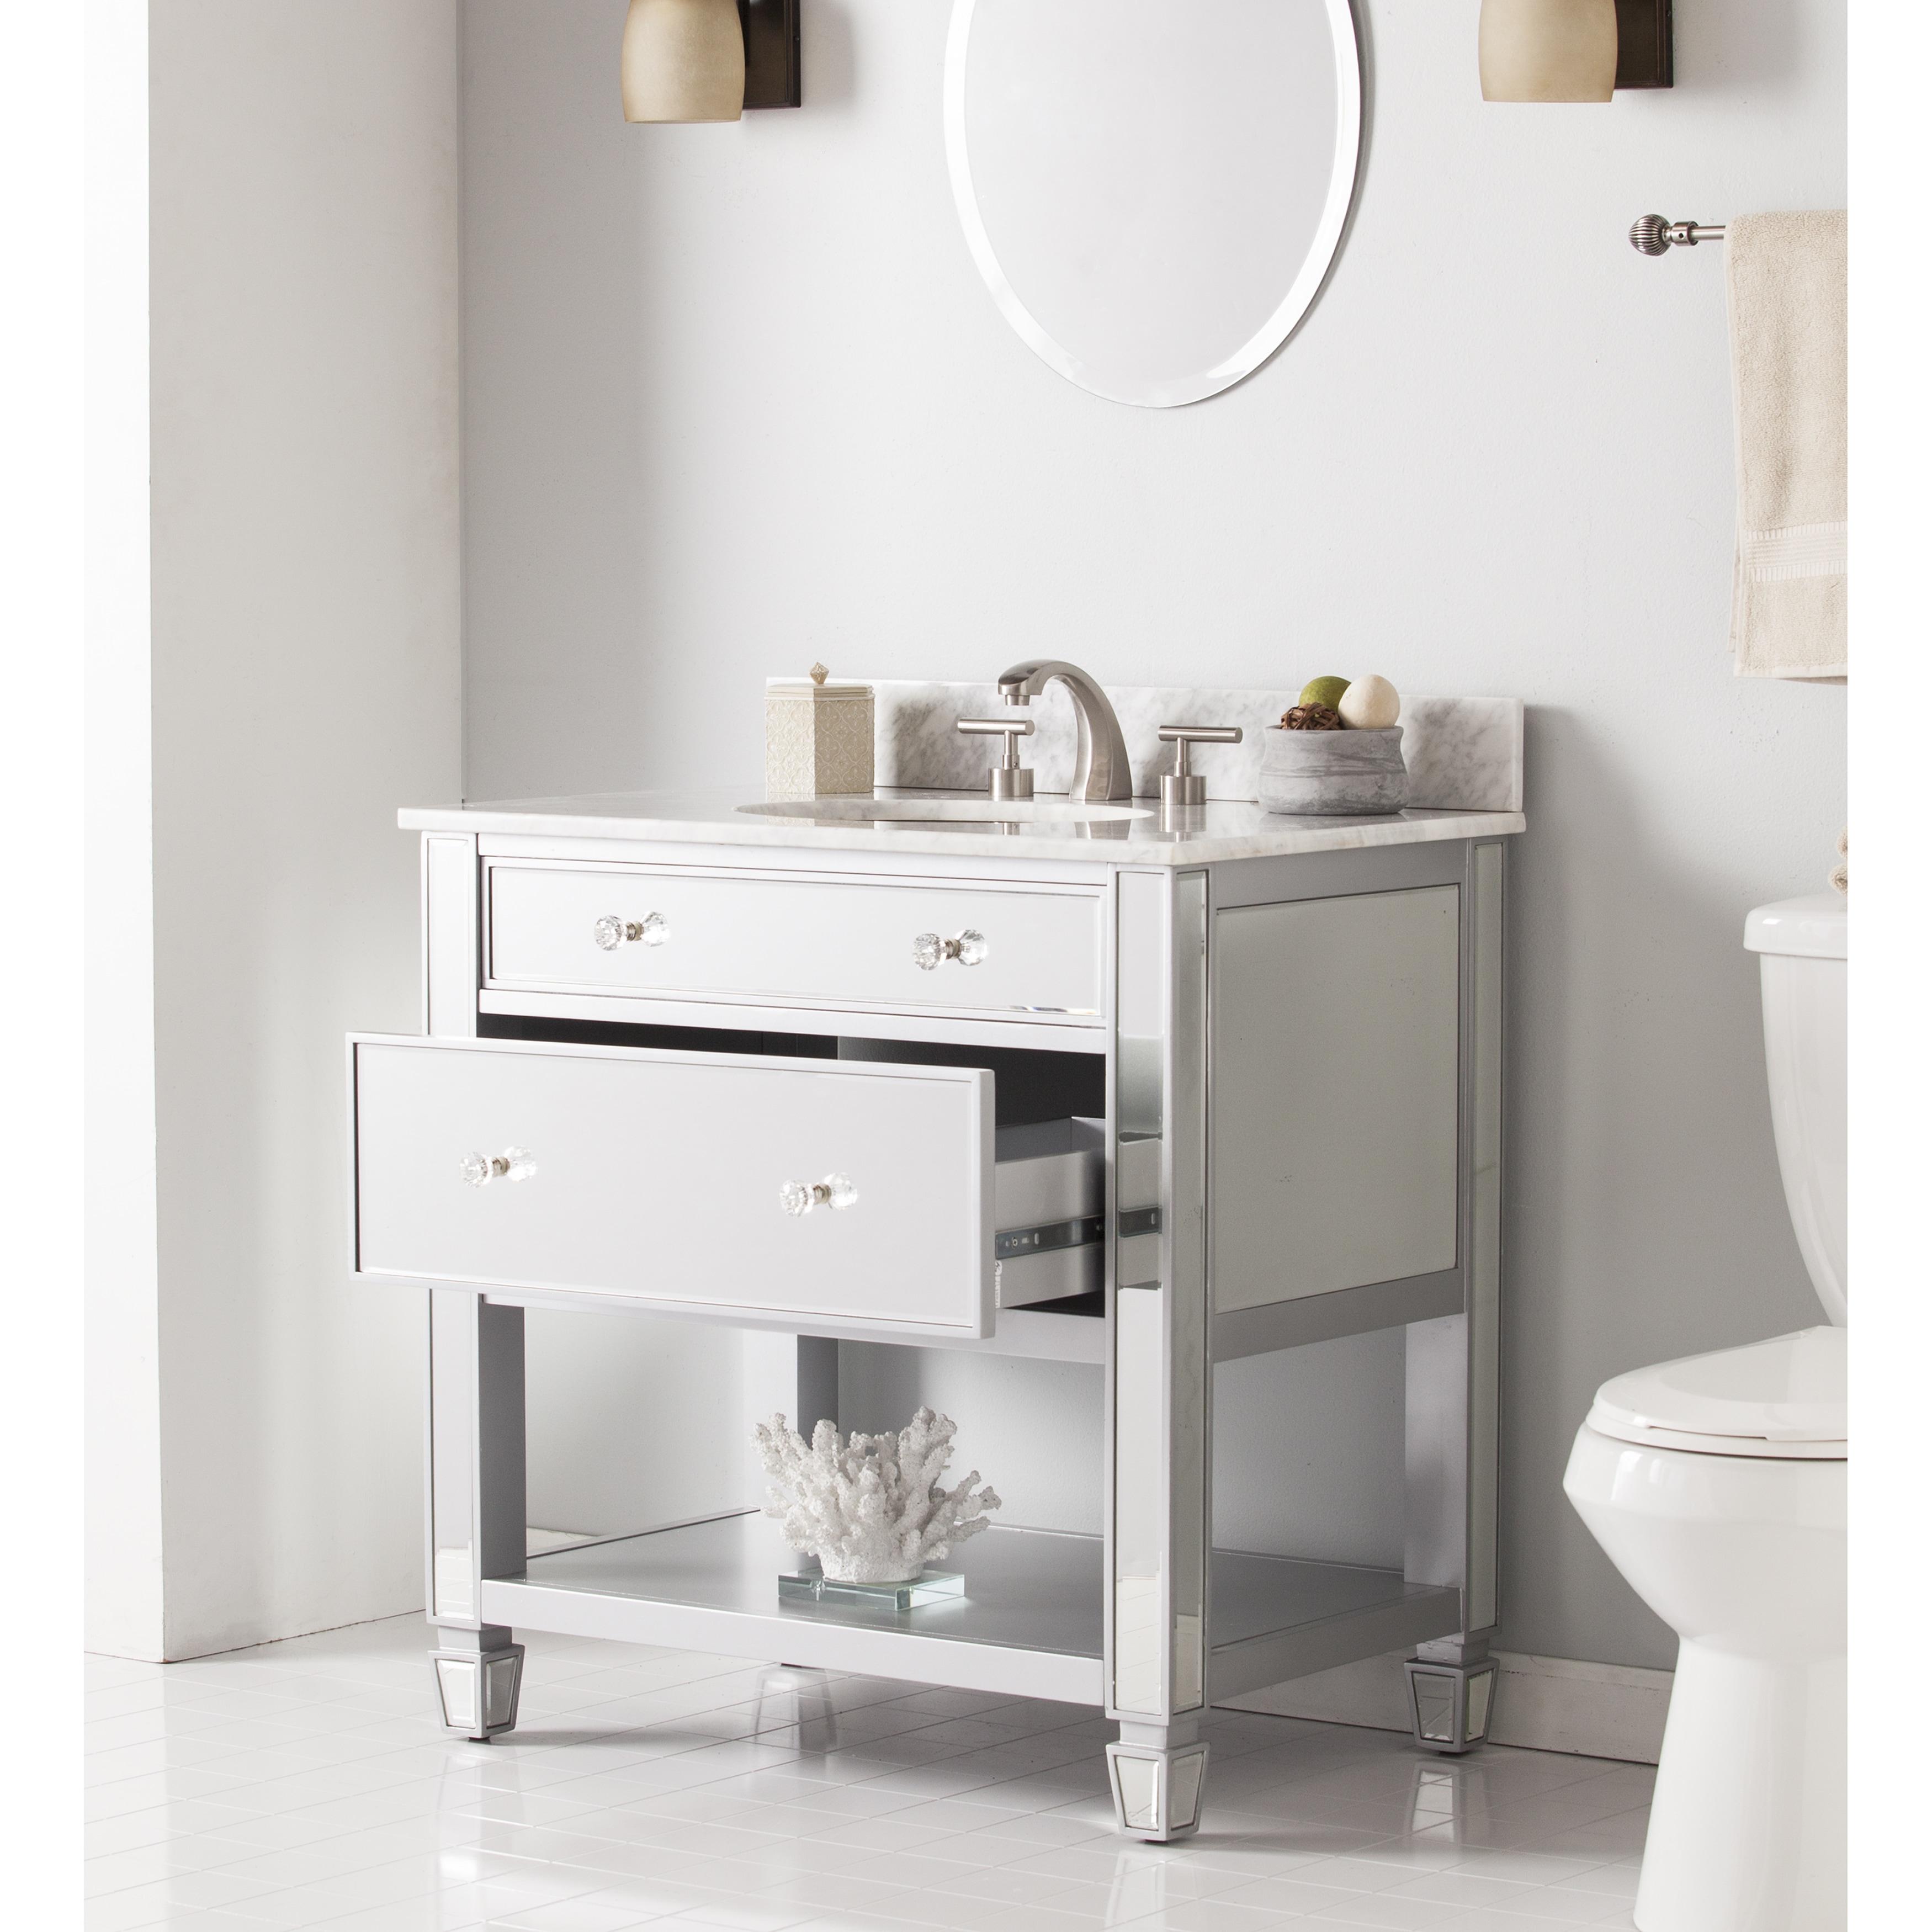 inch vanity three modulus hole concrete dxv sink bathroom product